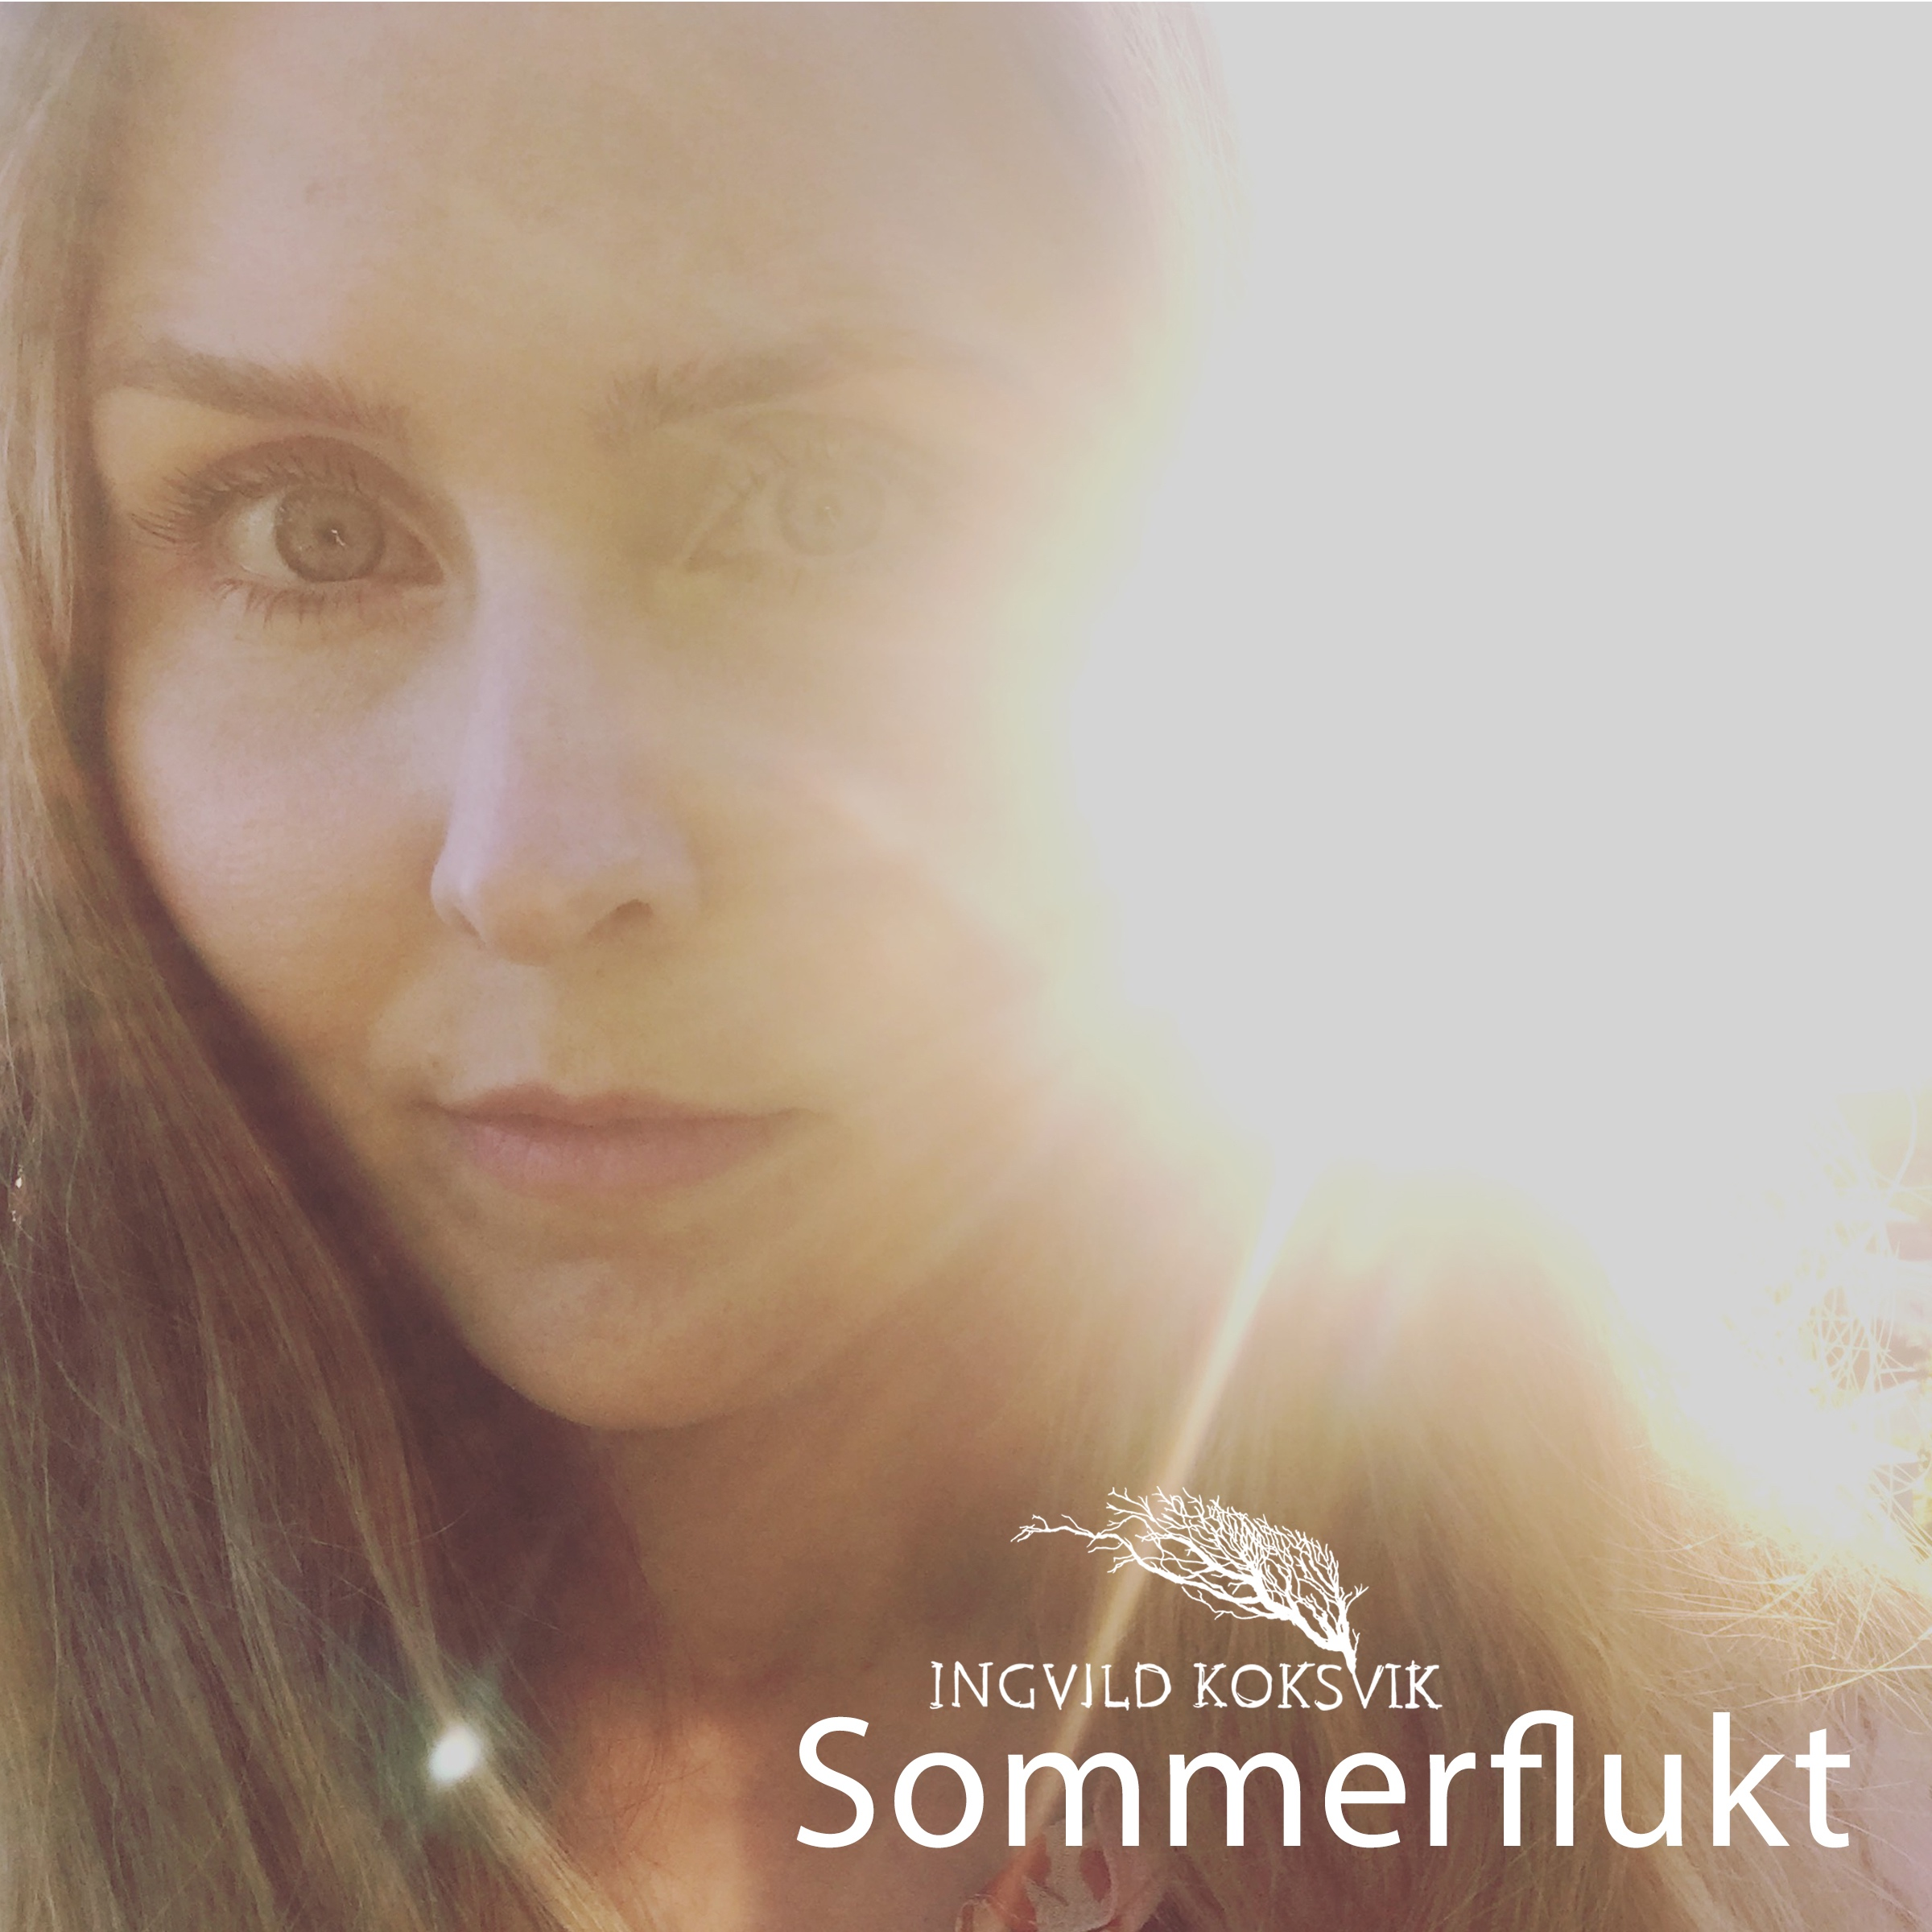 Sommerflukt (single) - Ingvild Koksvik